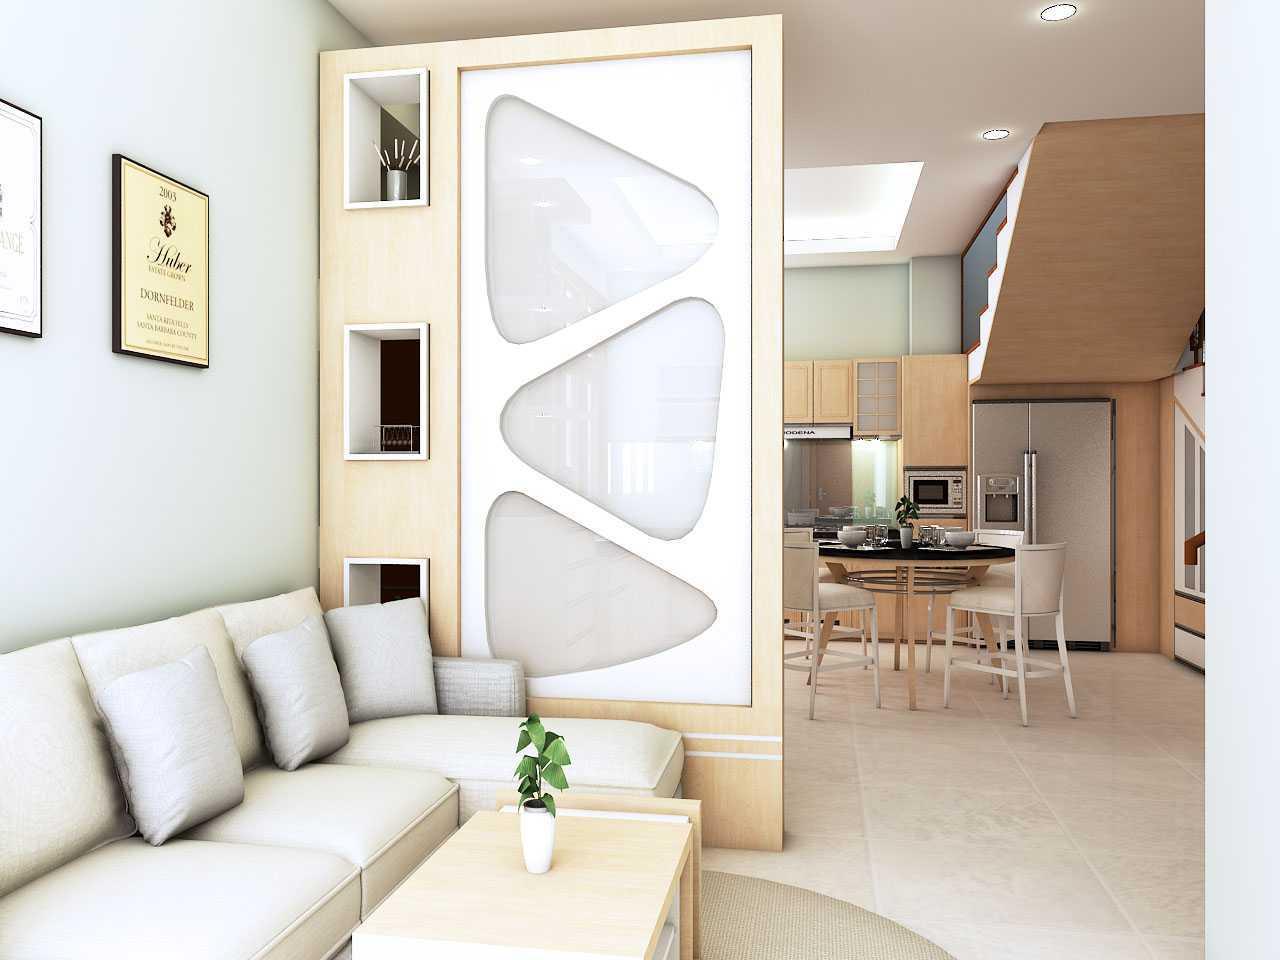 Arteta interior design furniture partisi dan kitchen set modern kontemporer surakarta kota surakarta